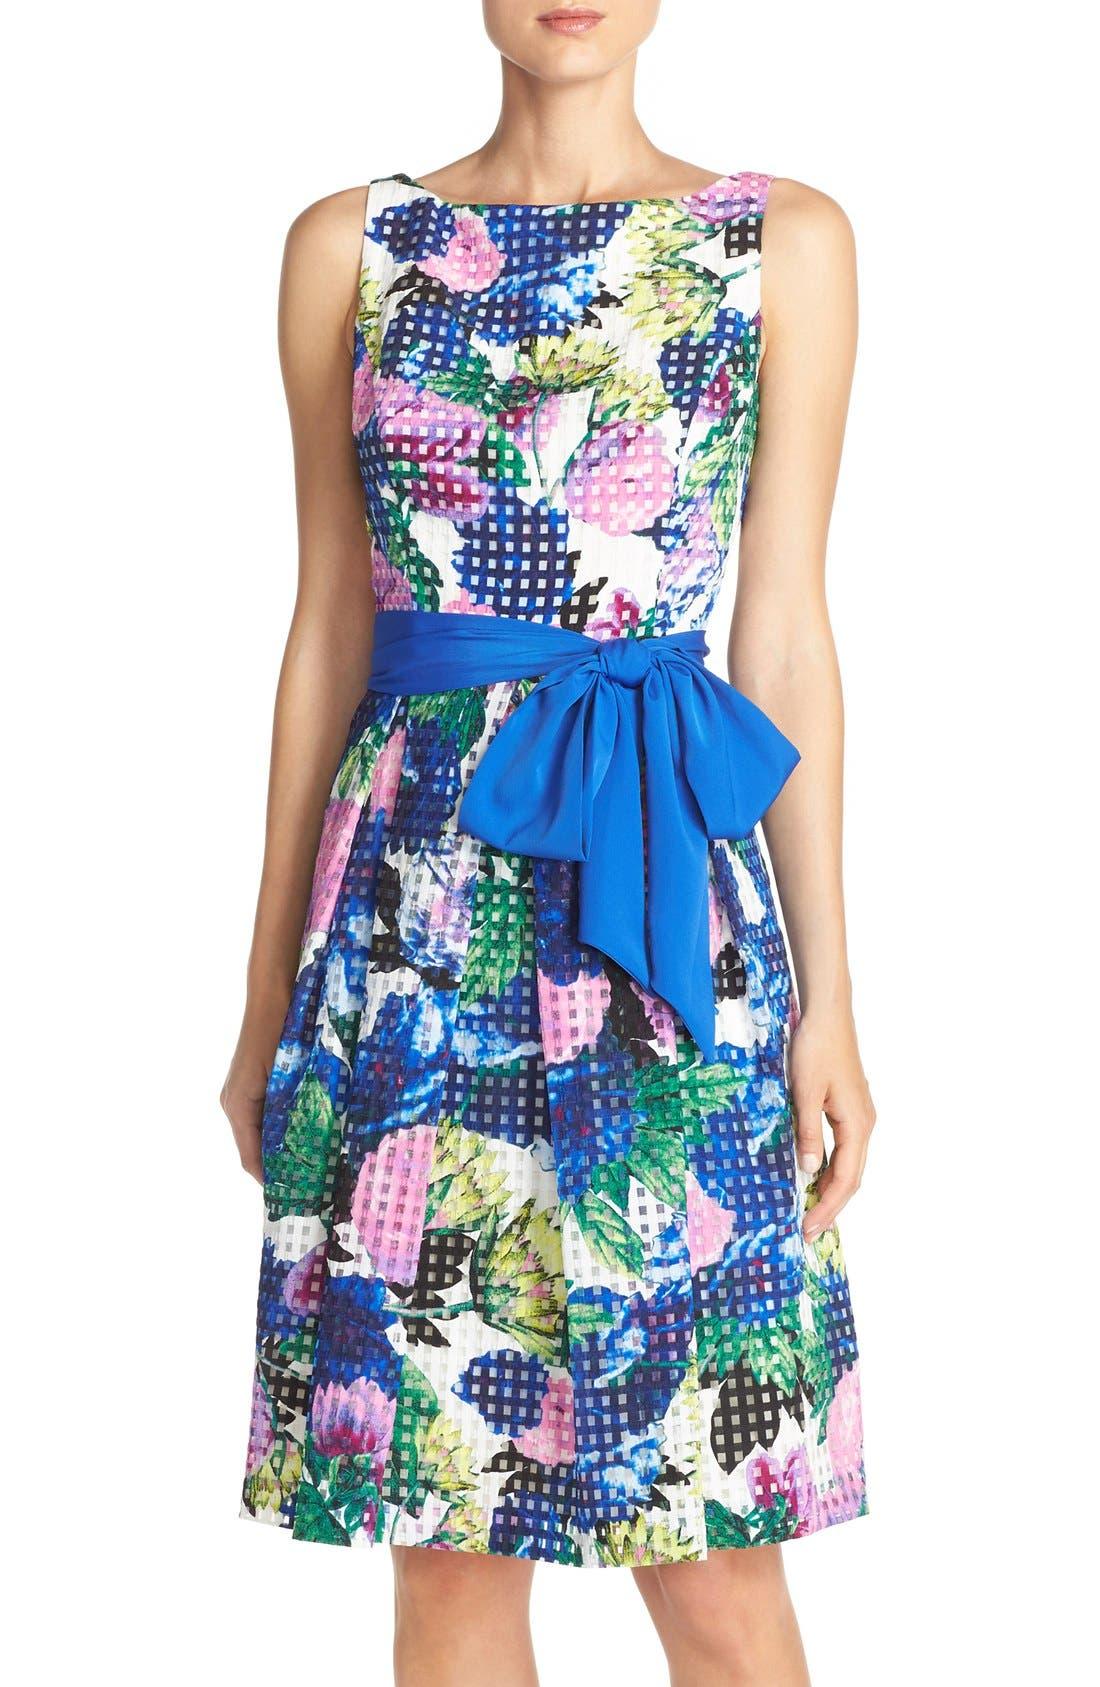 Alternate Image 1 Selected - Eliza J Floral Check Organza Fit & Flare Dress